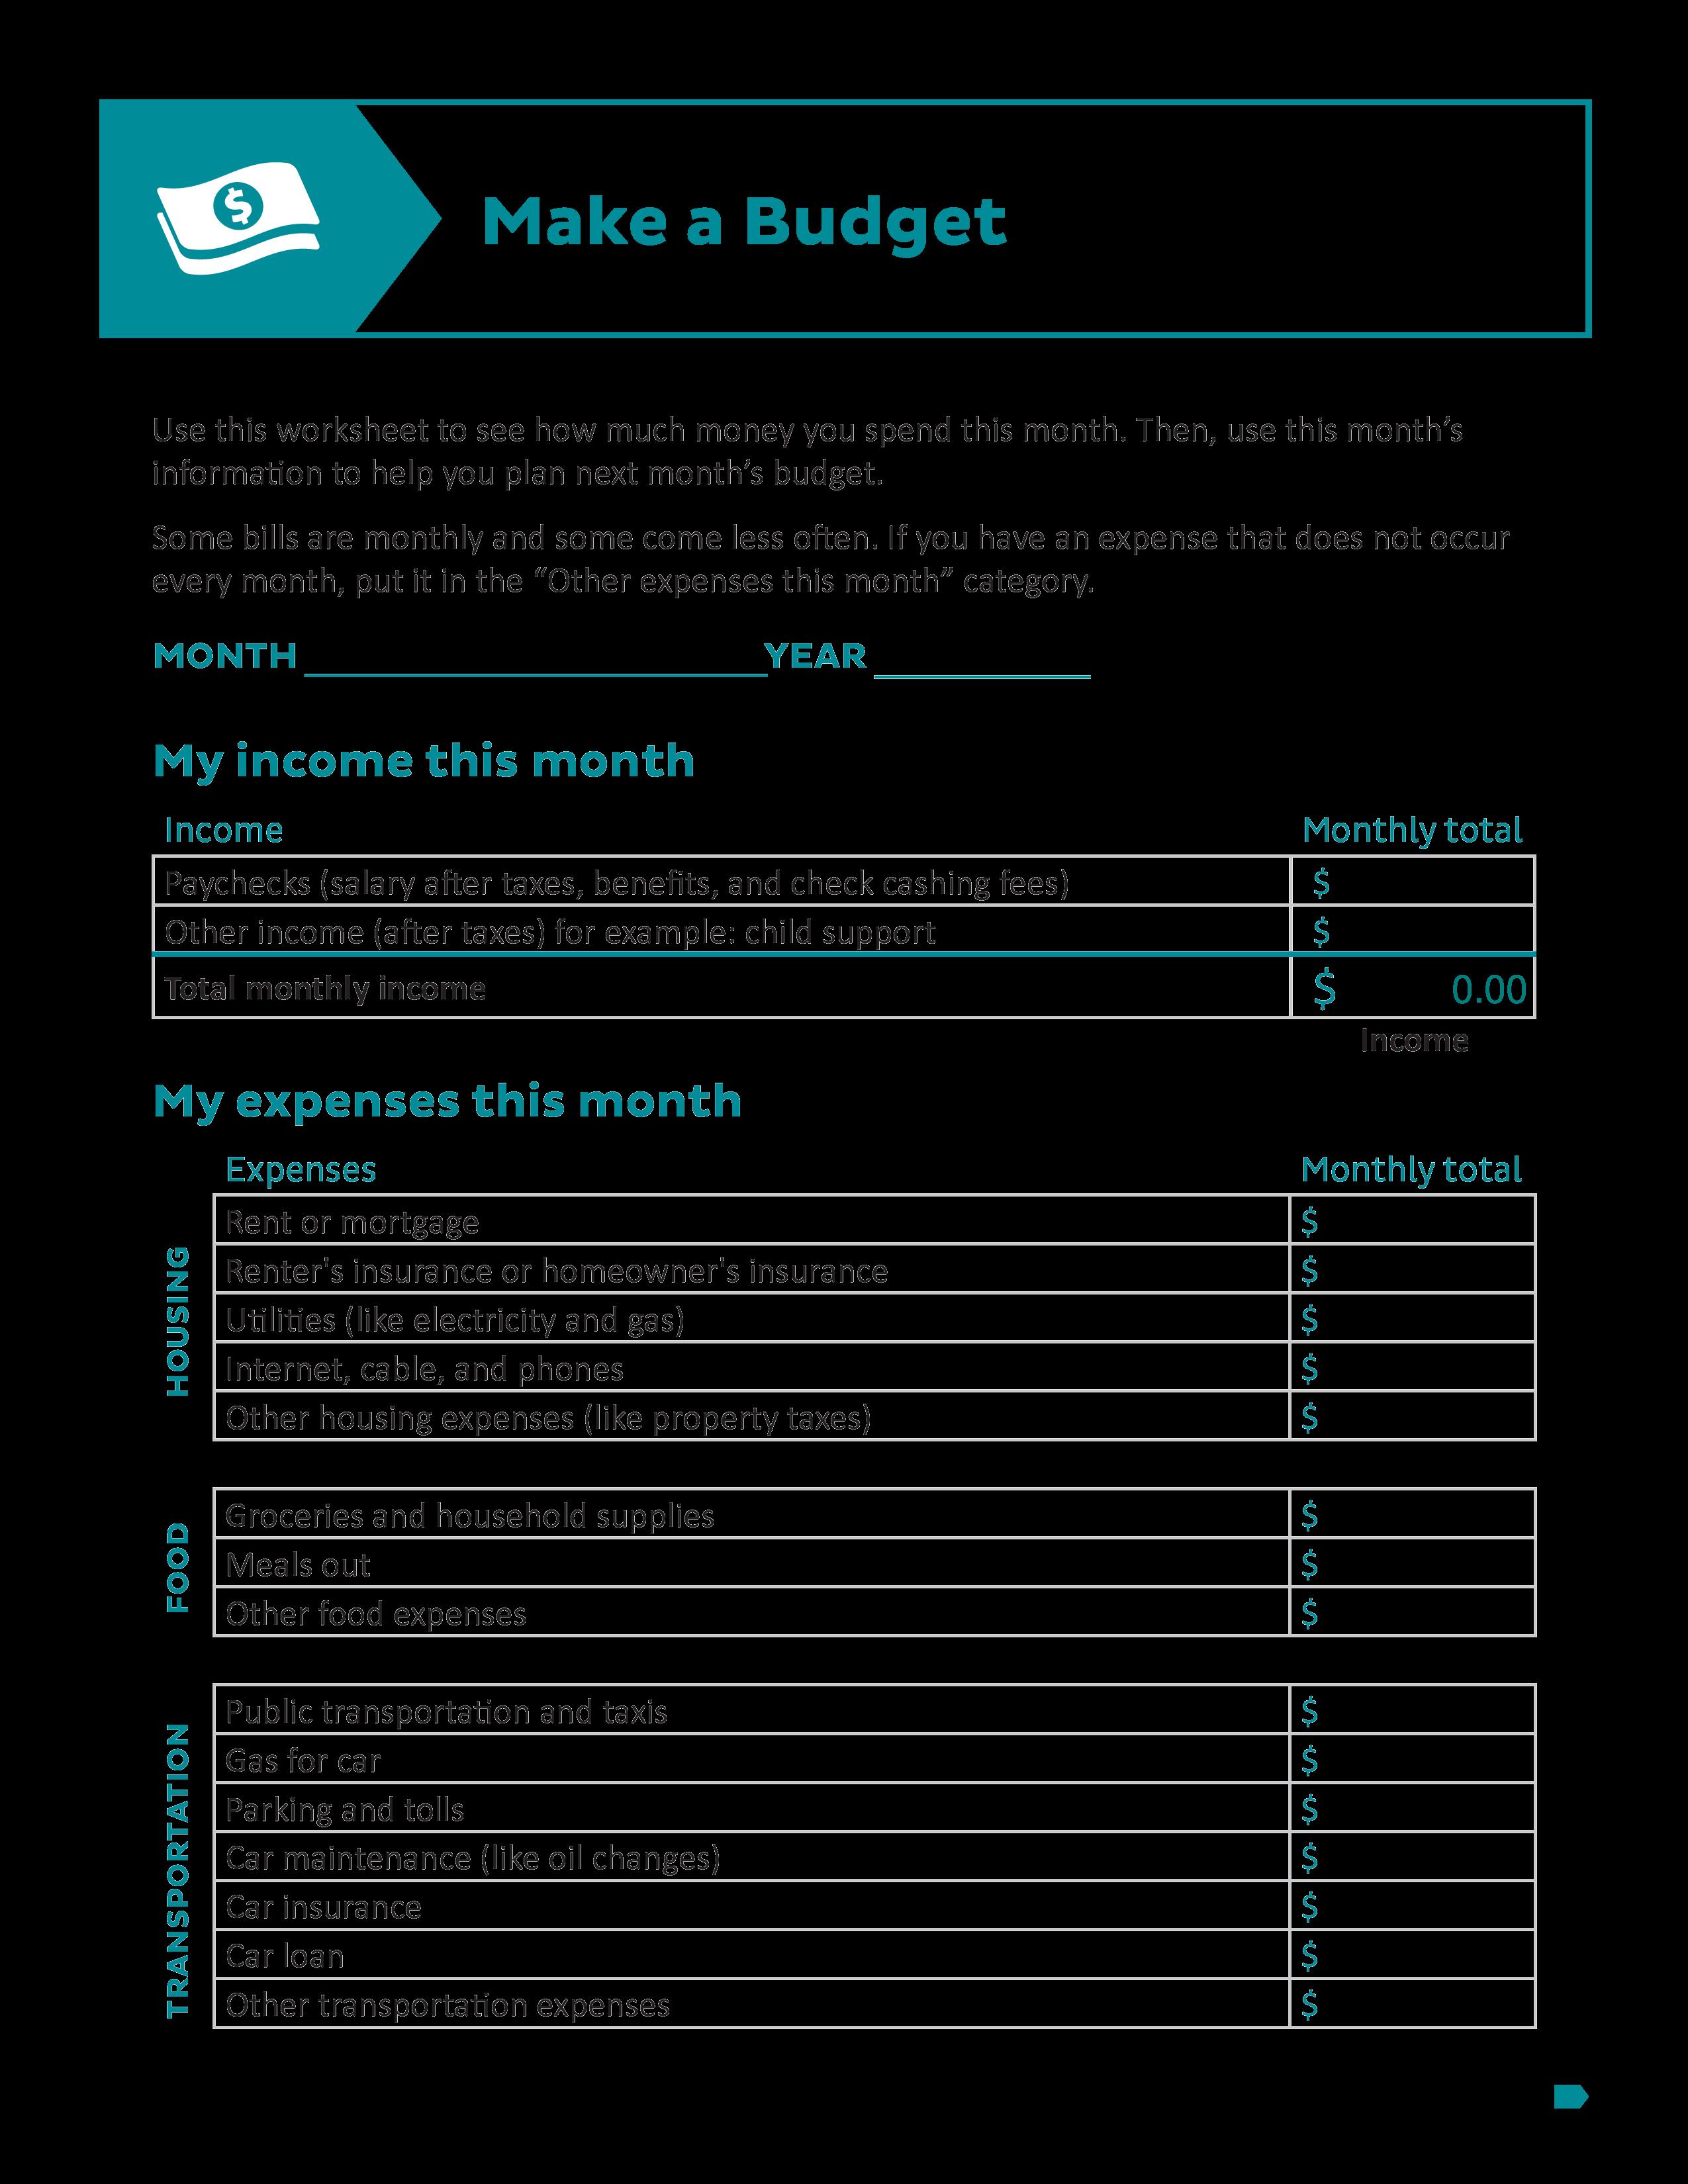 printable budget worksheets main image